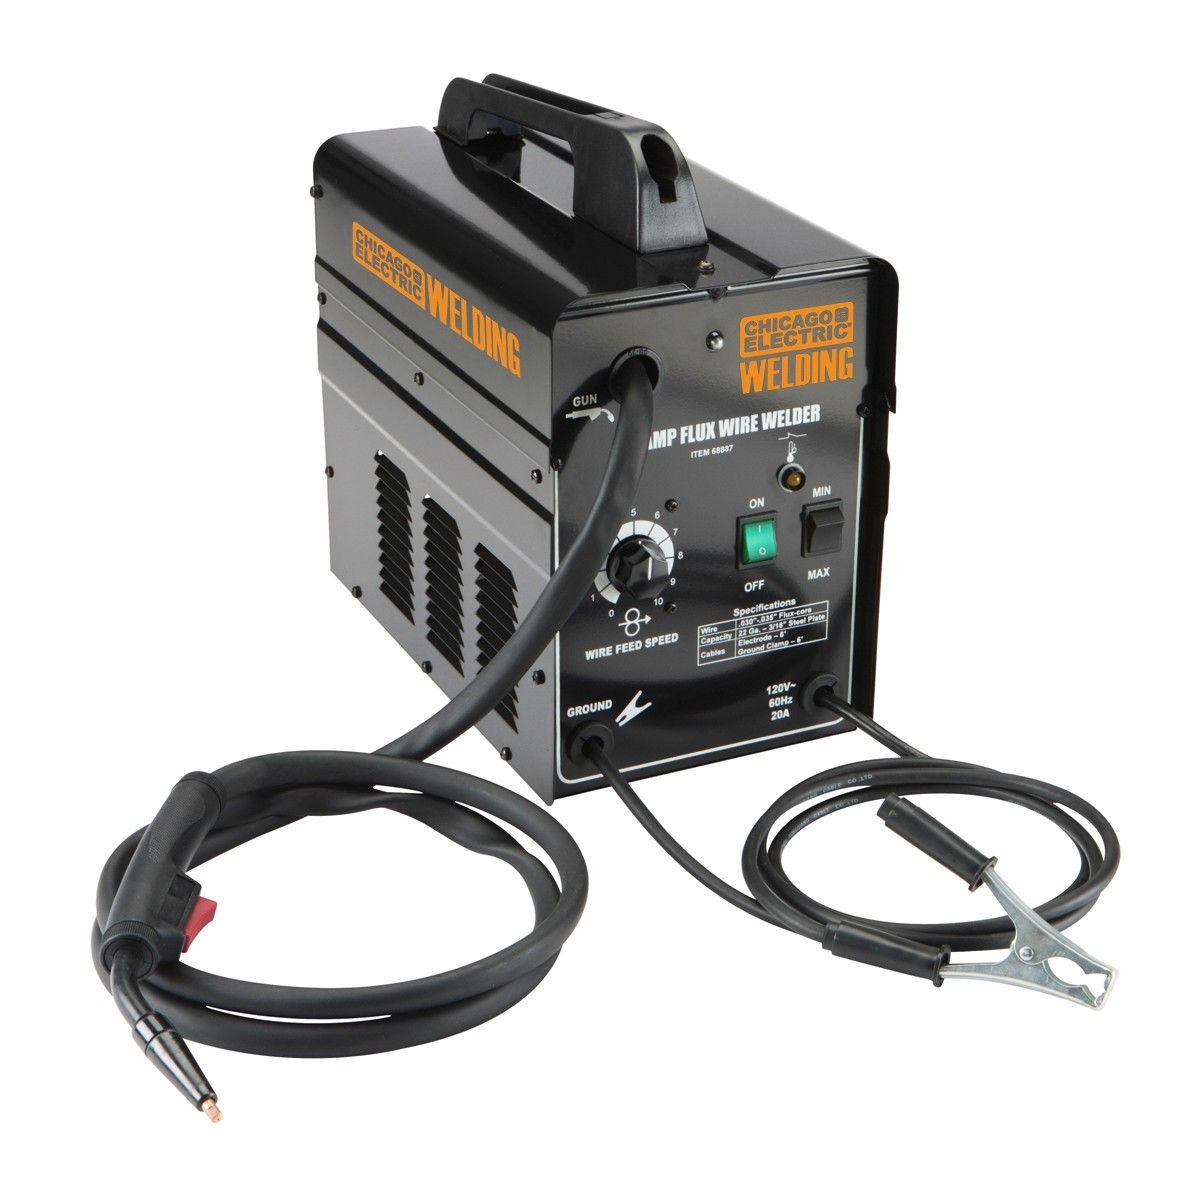 medium resolution of  89 99 chicago electric welding 68887 90 amp flux wire welder black 89 99 chicago electric